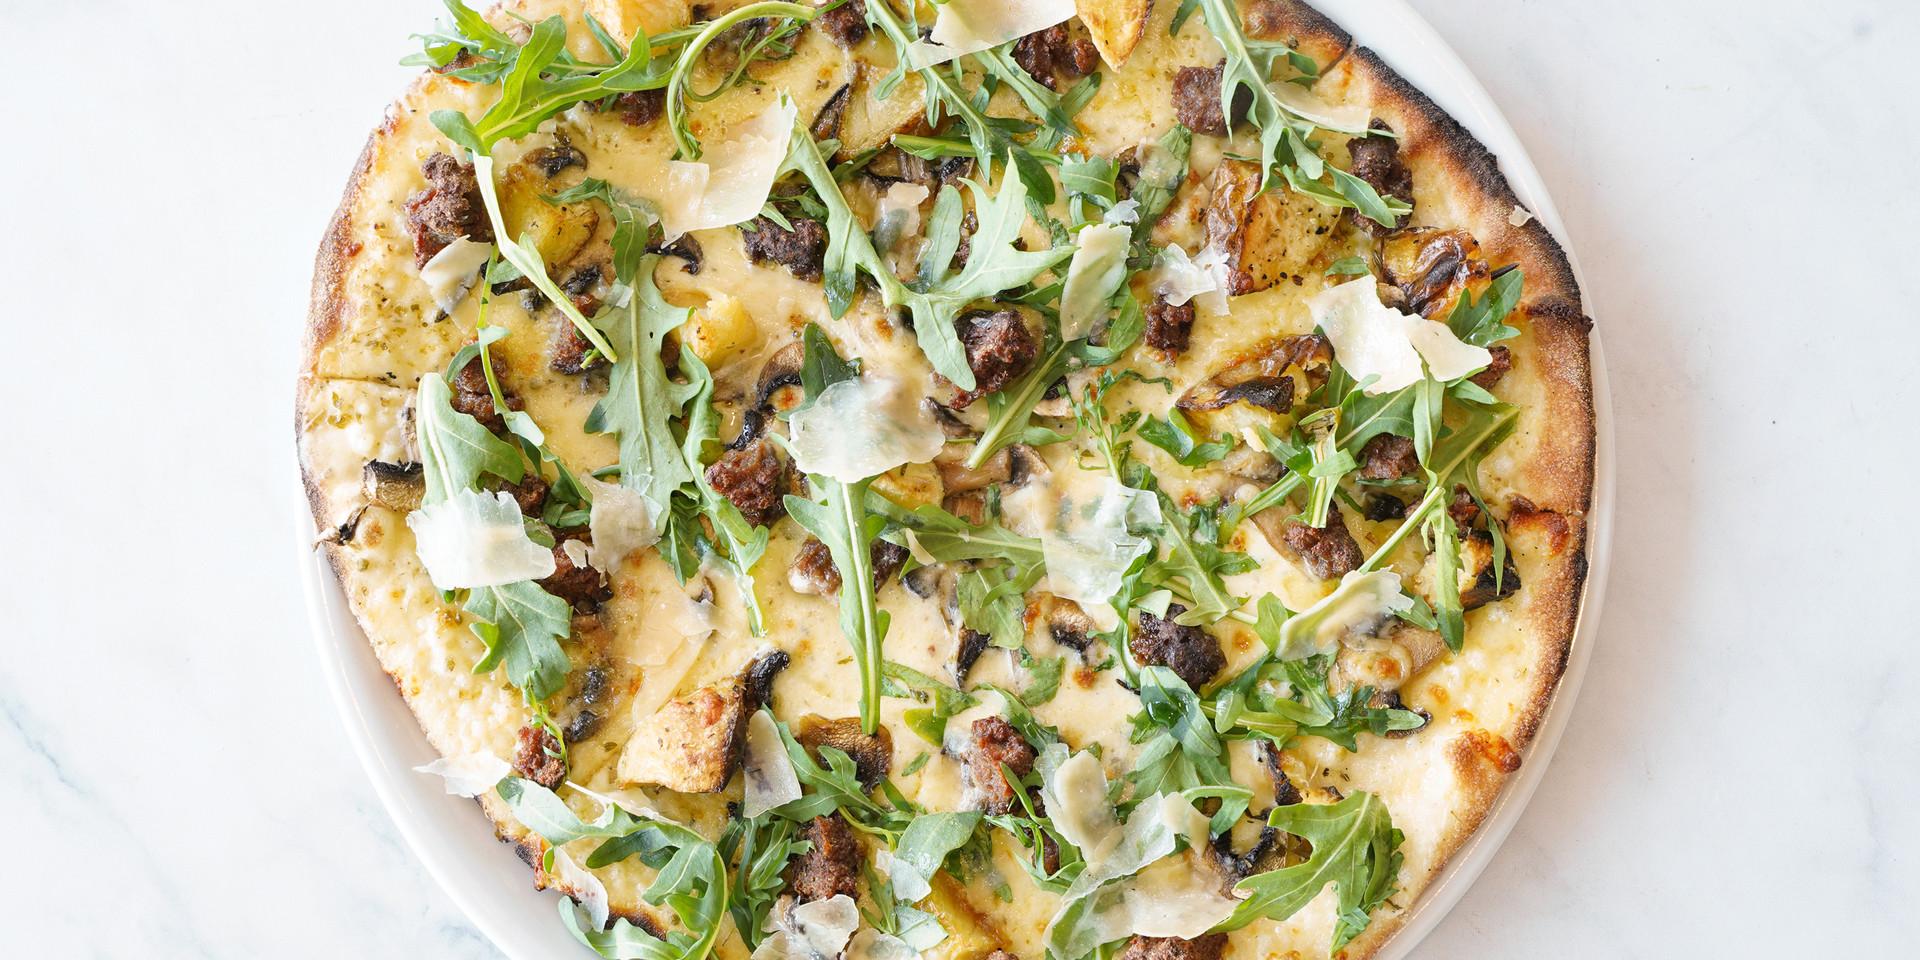 Crento Italian Restaurant Salsicce Pizza